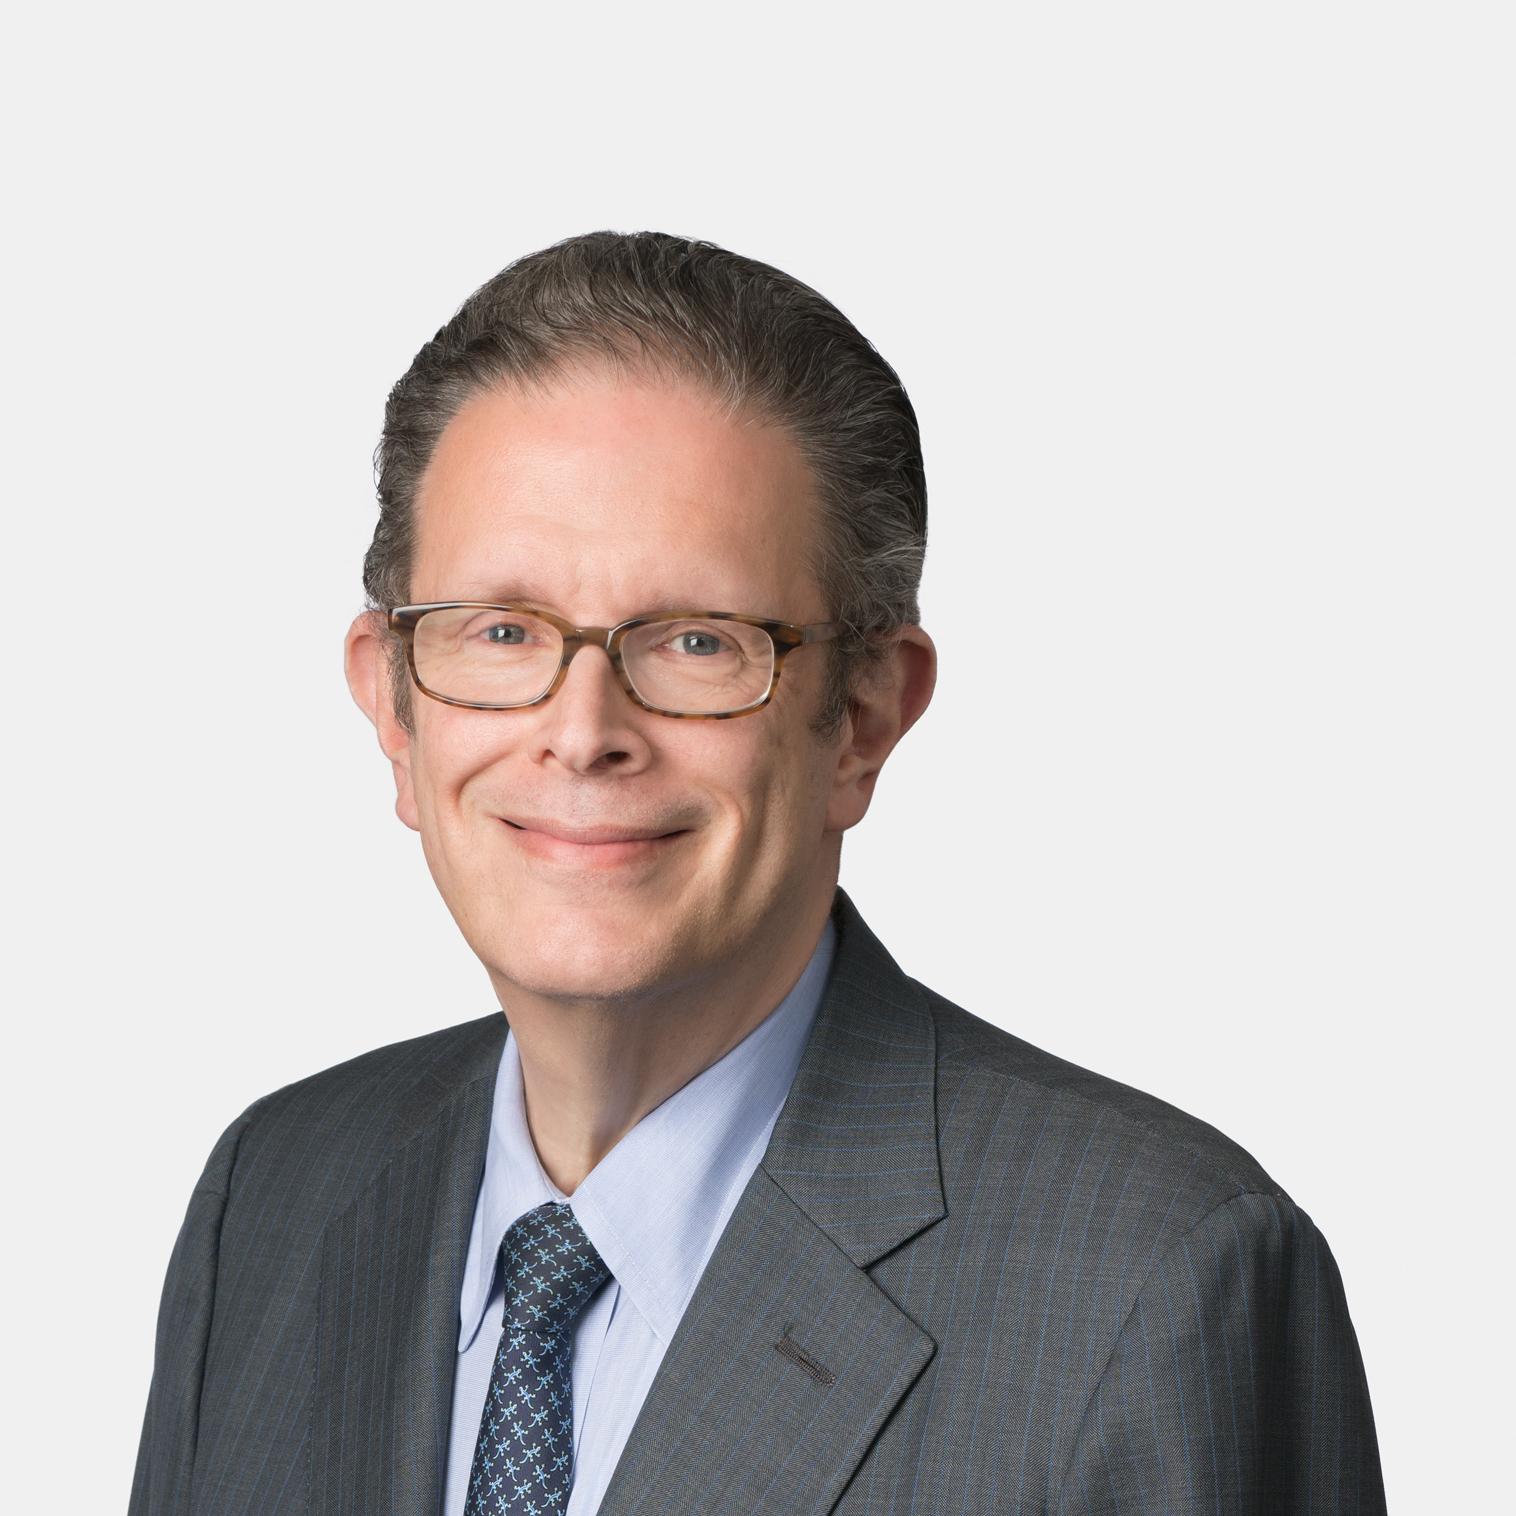 Rory J. McEvoy